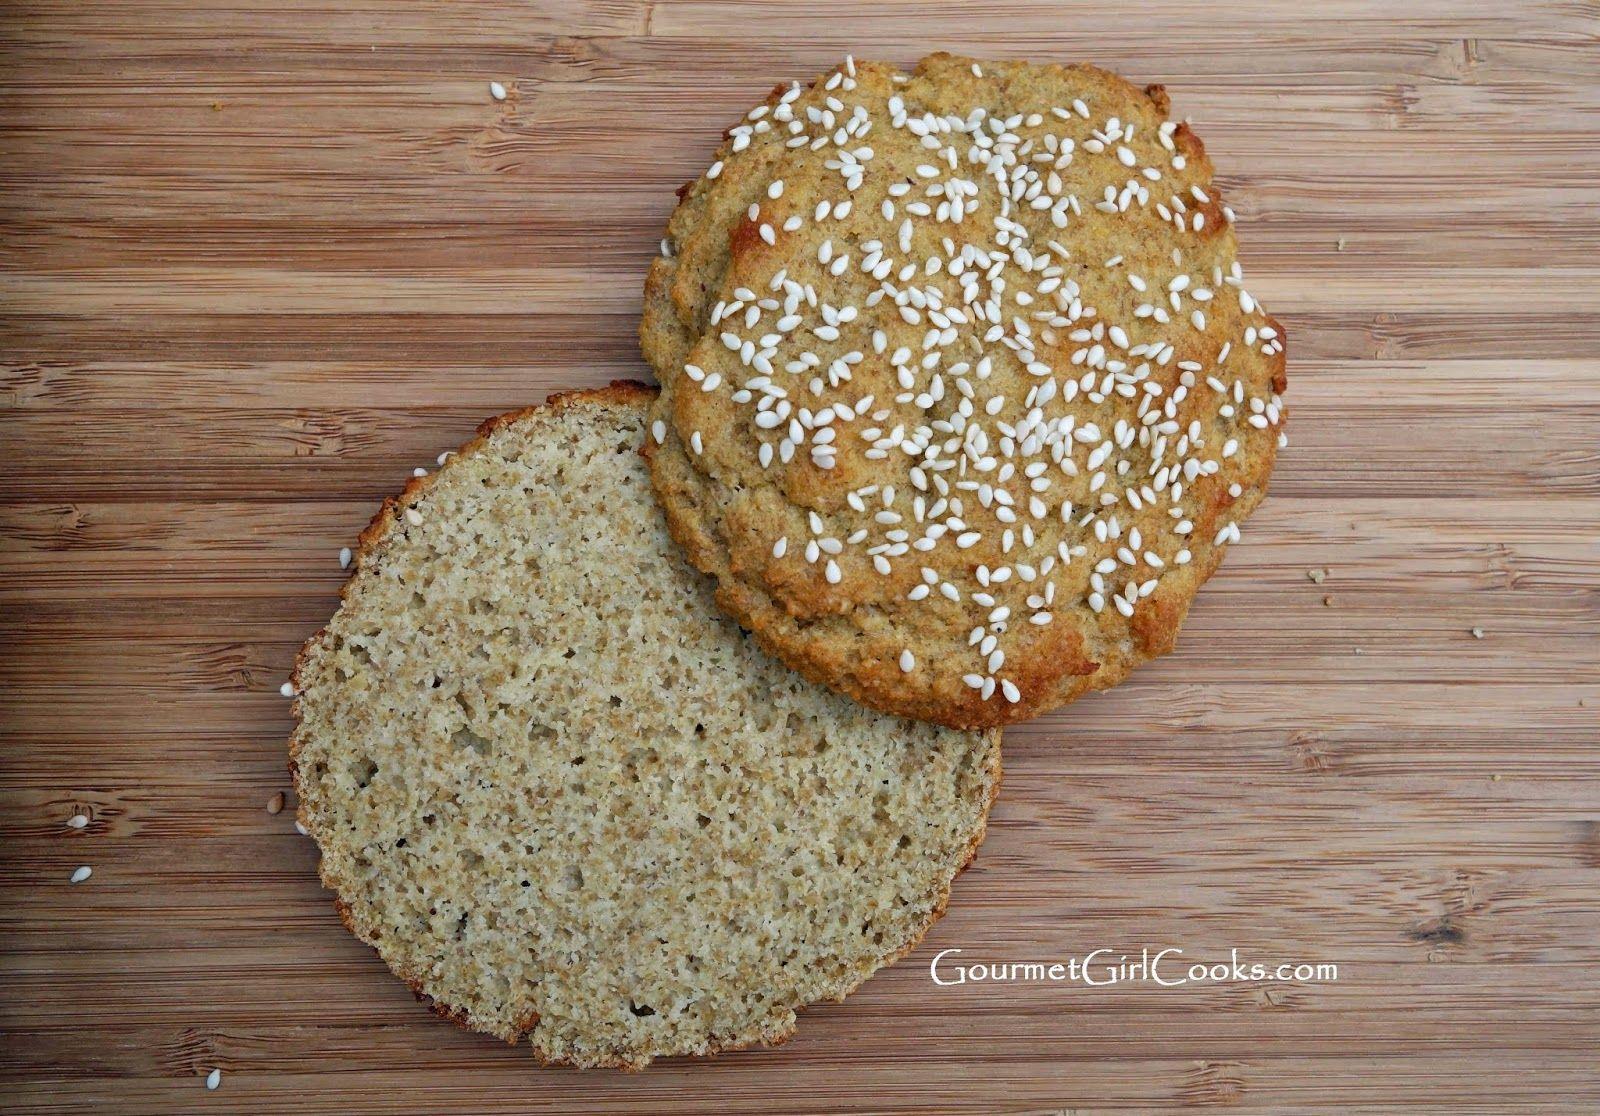 Gourmet Girl Cooks: Sesame Seed Sandwich Buns -- Low Carb, Wheat, Grain & Gluten-Free